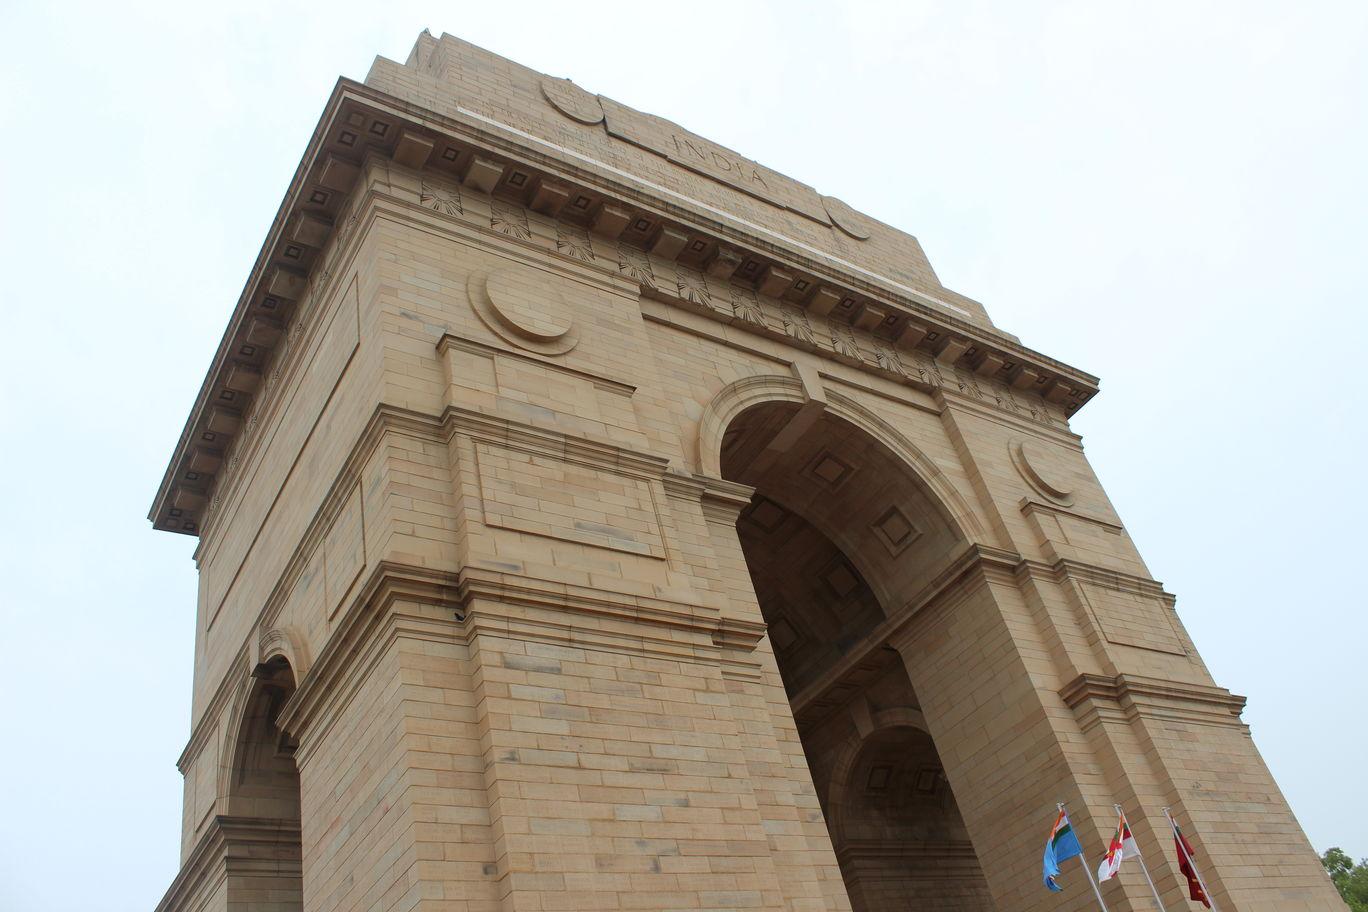 Photo of India Gate By Krishnadev